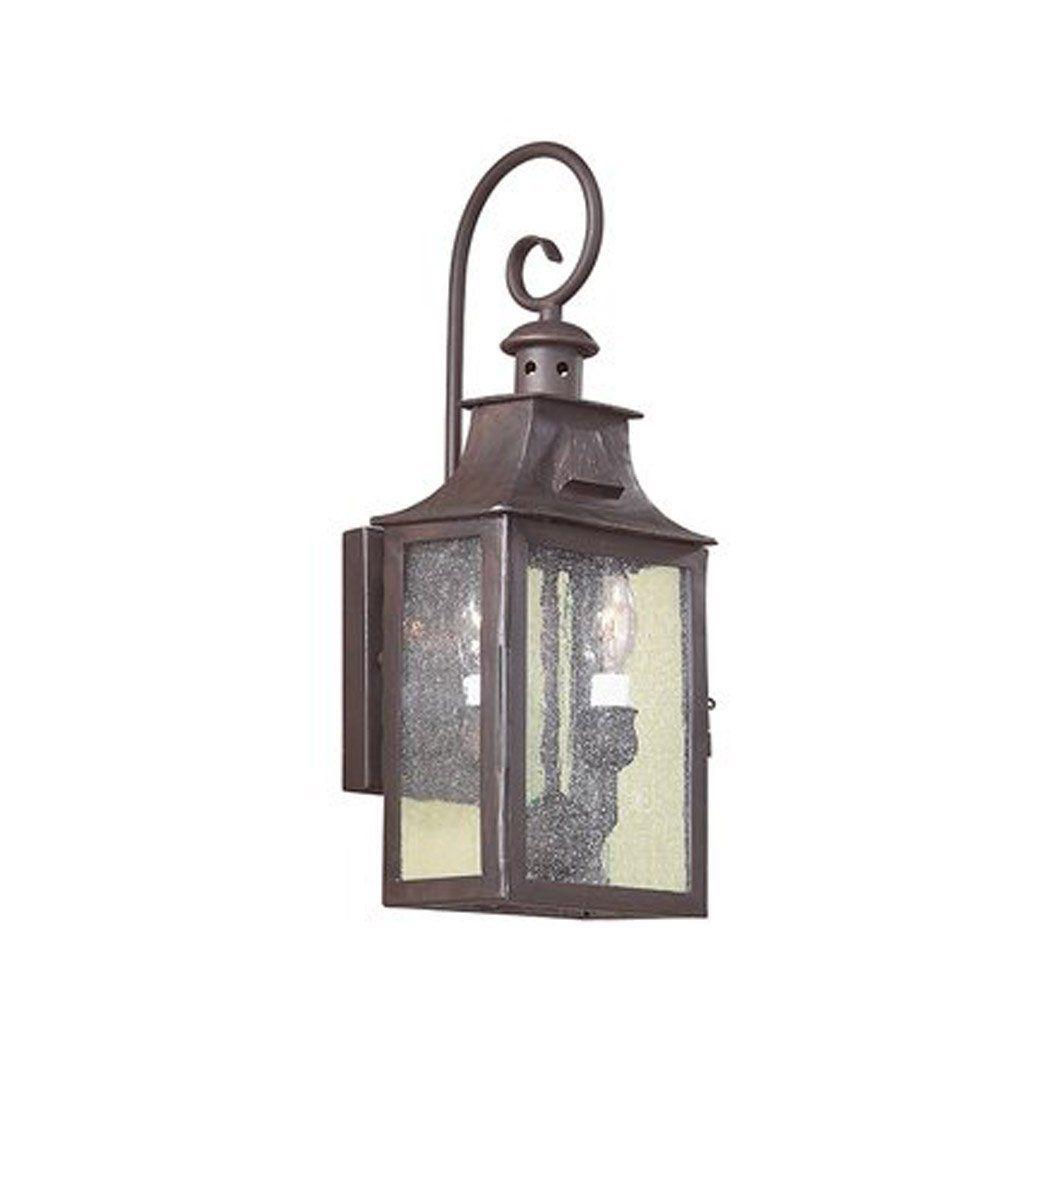 Troy Csl Lighting Bcd9001obz Newton 2 Light 18 Inch Old Bronze Outdoor Wall Lantern In